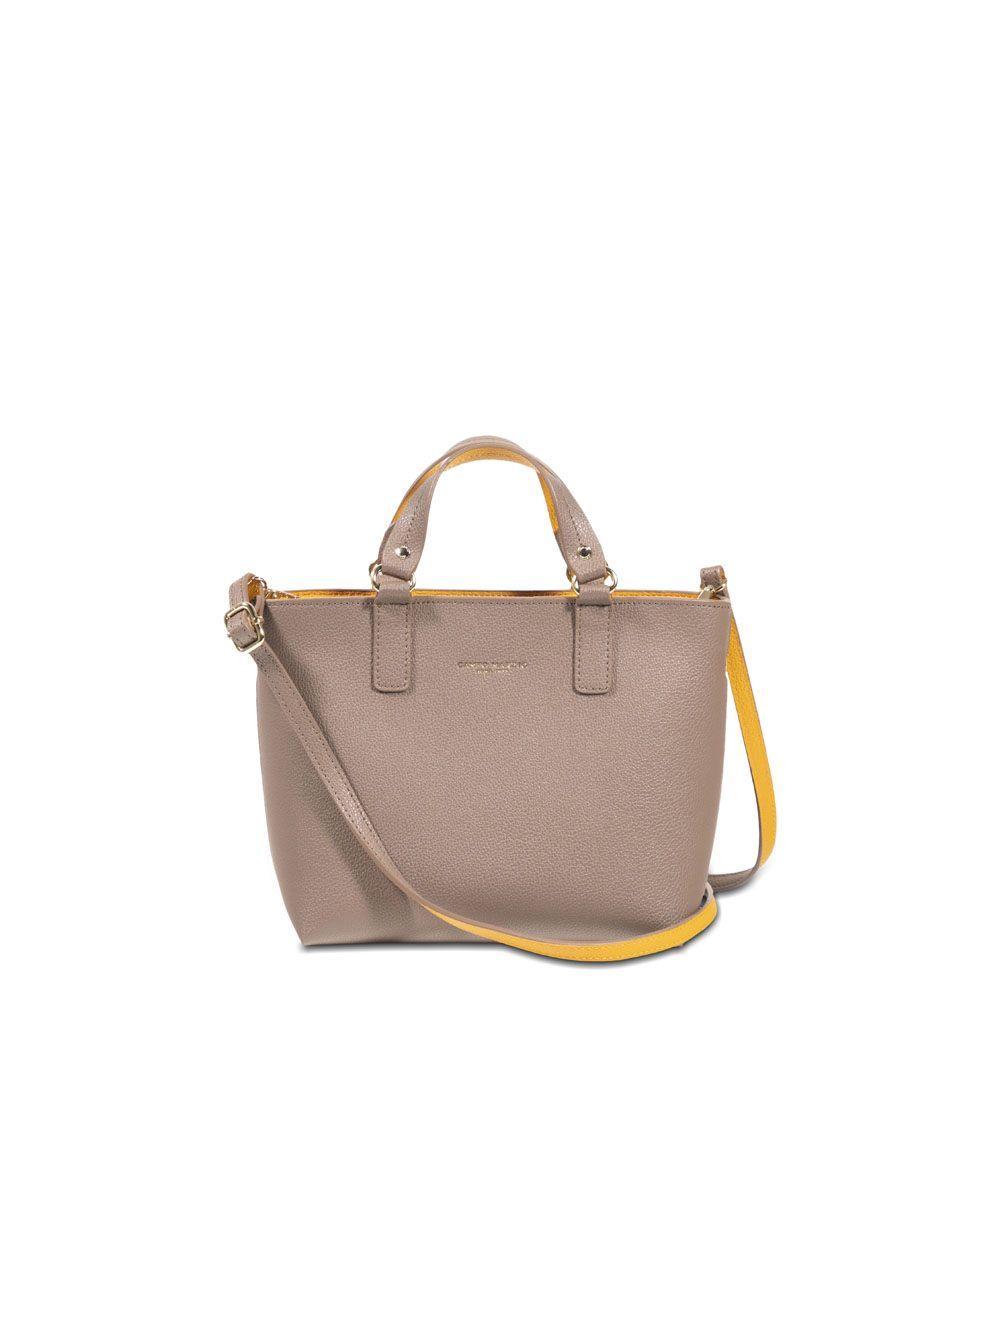 Handbag With Crossbody Strap